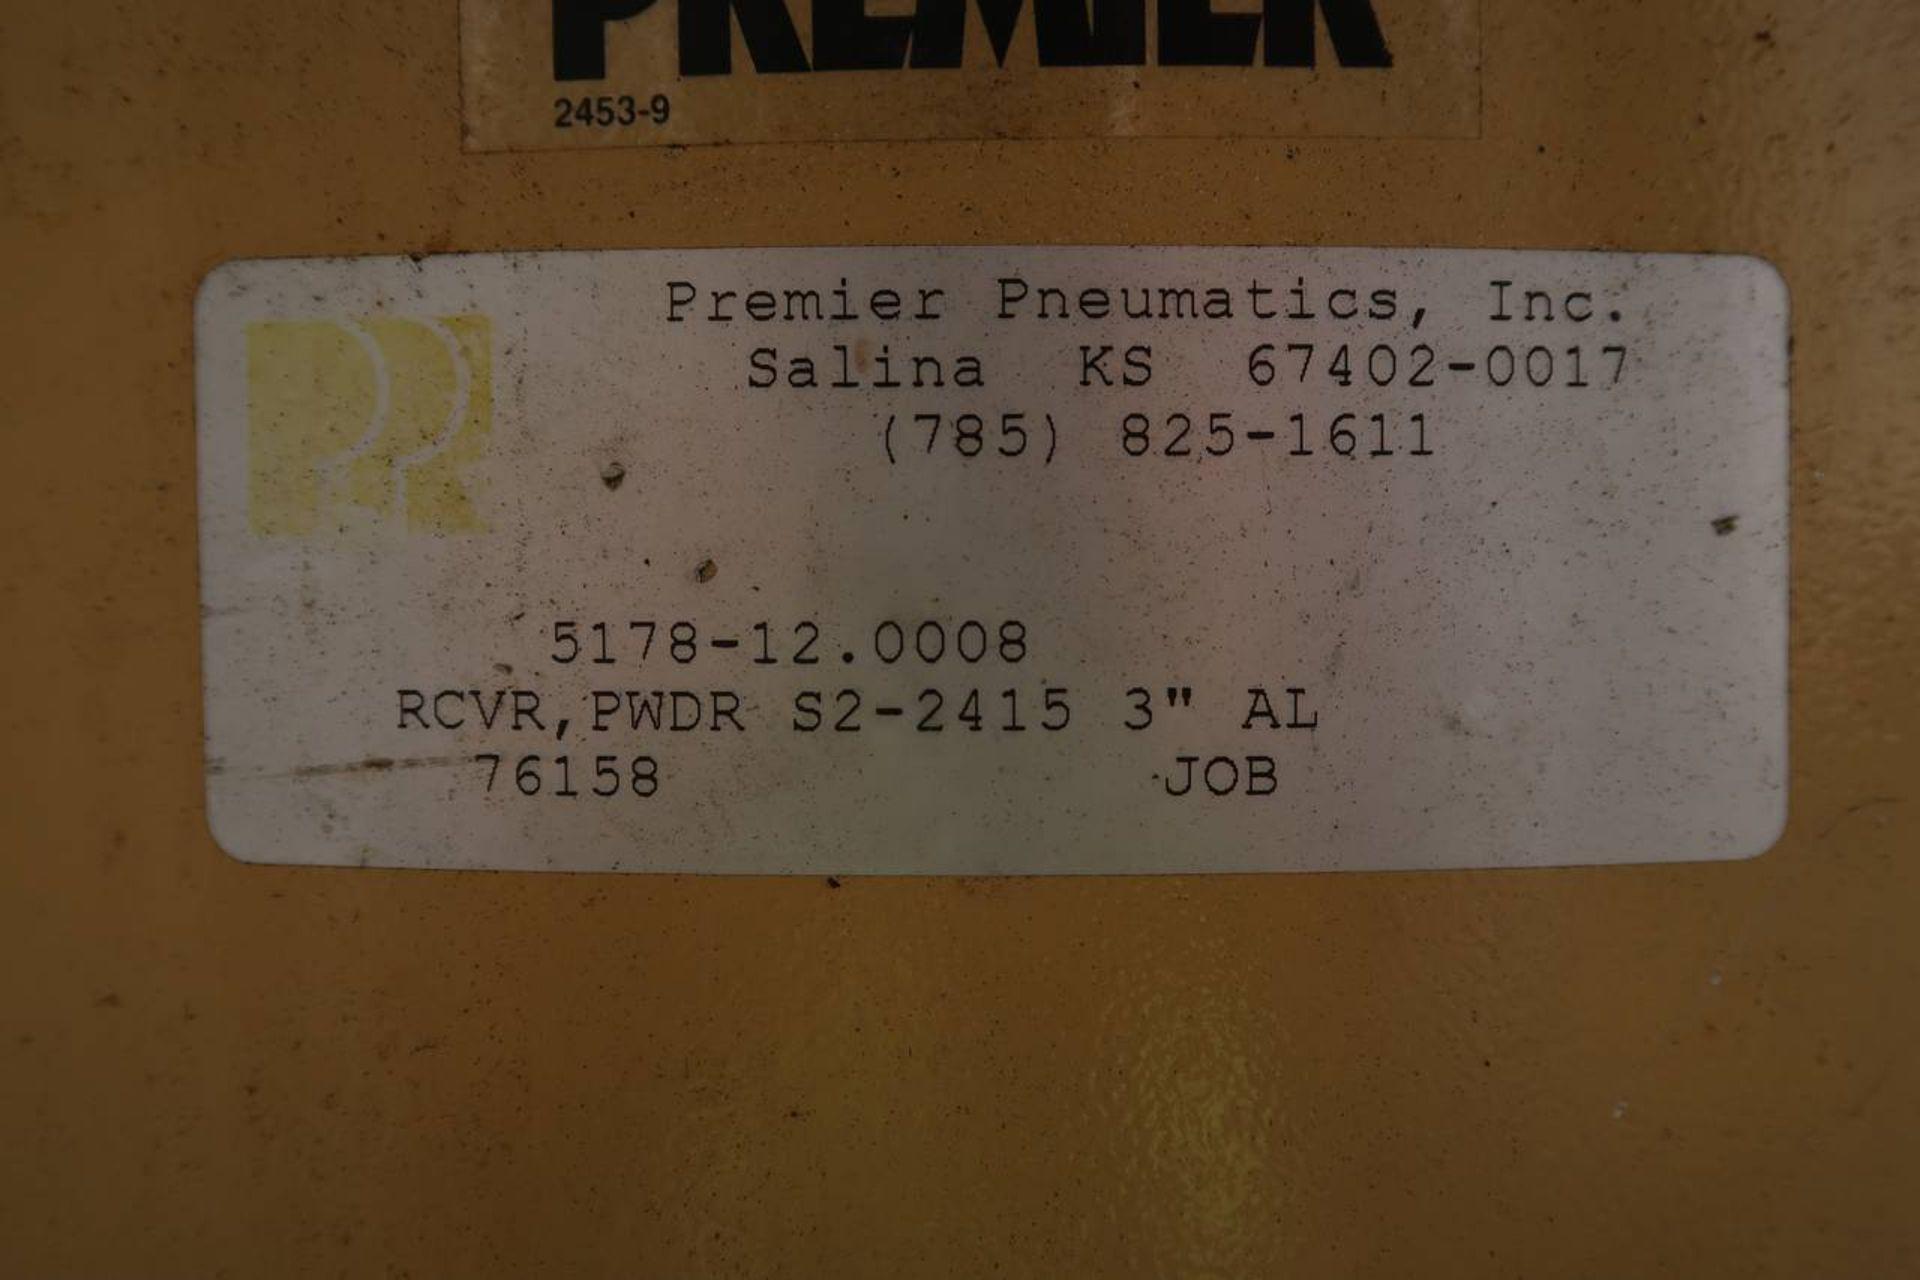 Premier Pneumatics S2-2415 Vacuum Hopper - Image 3 of 3